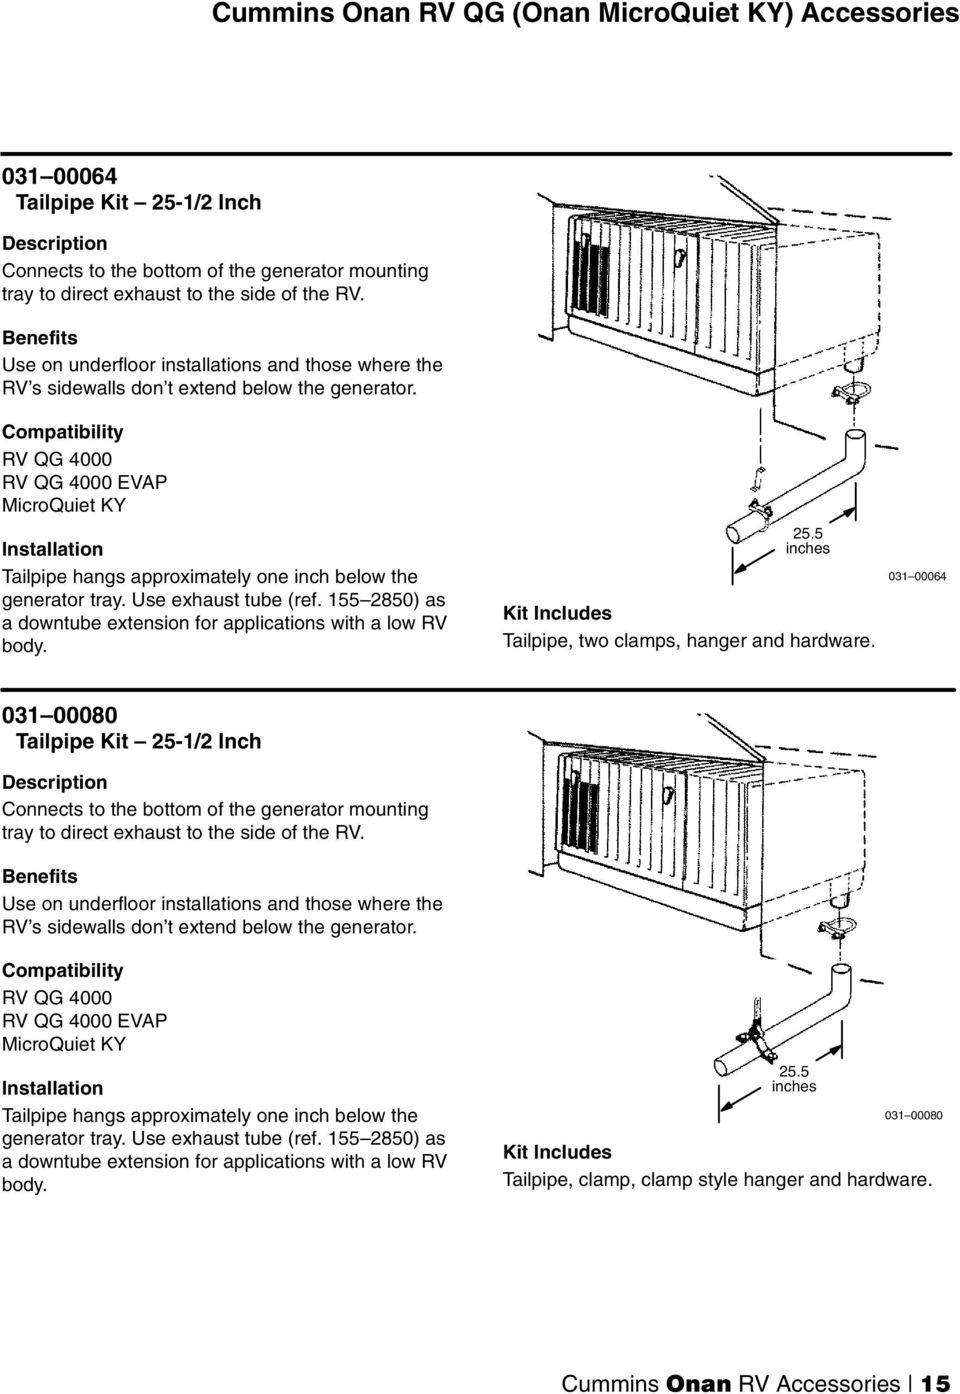 medium resolution of  onan rv generator accessories pdf on onan emerald 4000 wiring diagram onan rv generator wiring